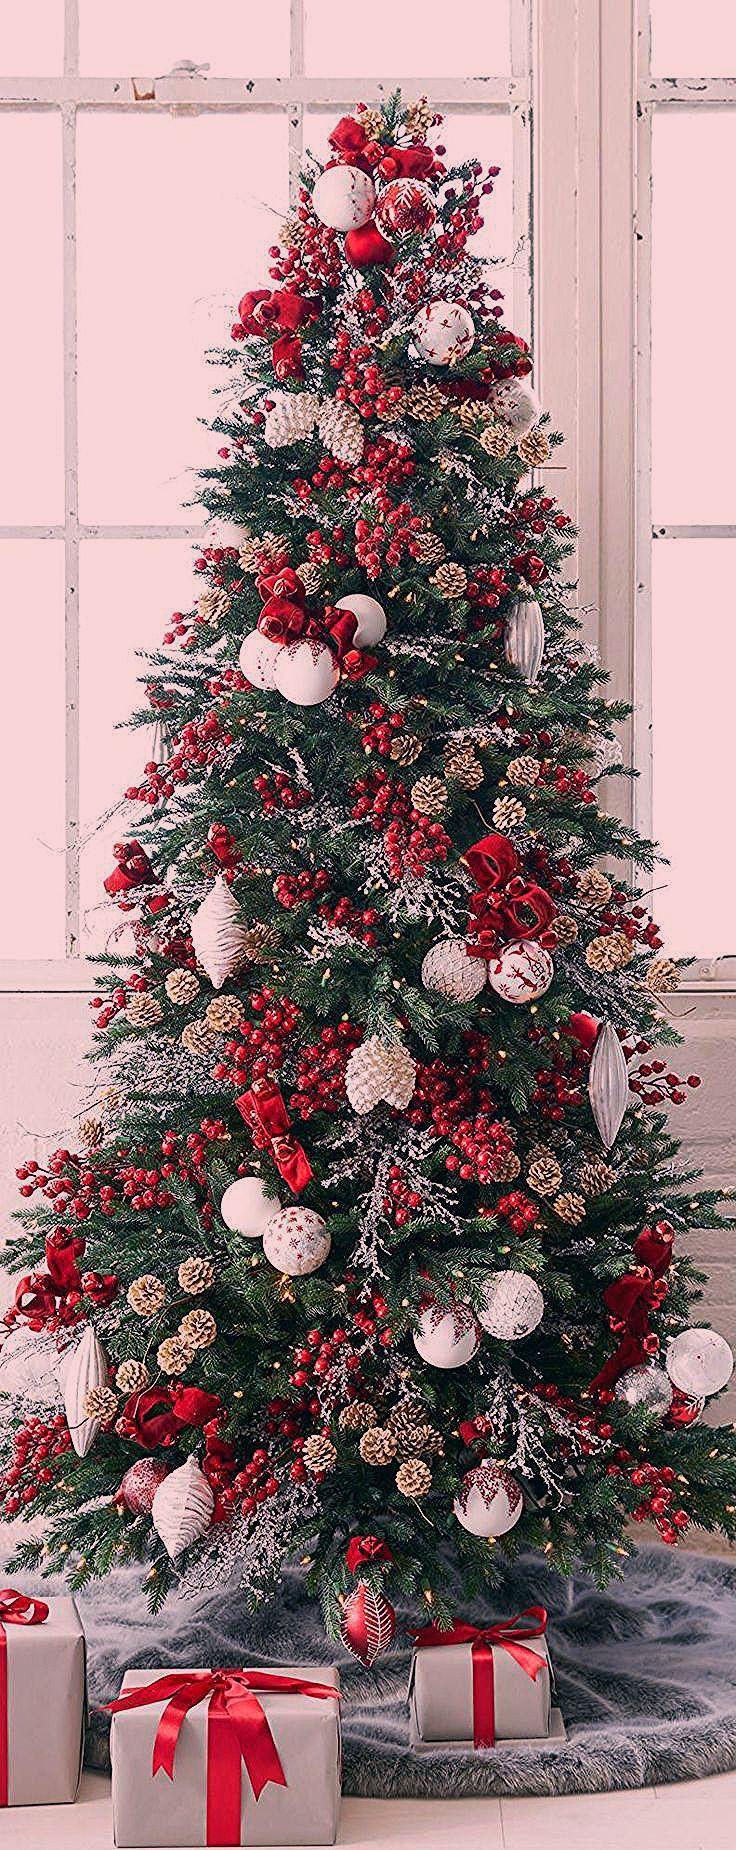 Gorgeous Christmas Tree | Country Christmas Decorating Ideas #christmas #christmastree #christmasornaments #howtoputribbononachristmastree